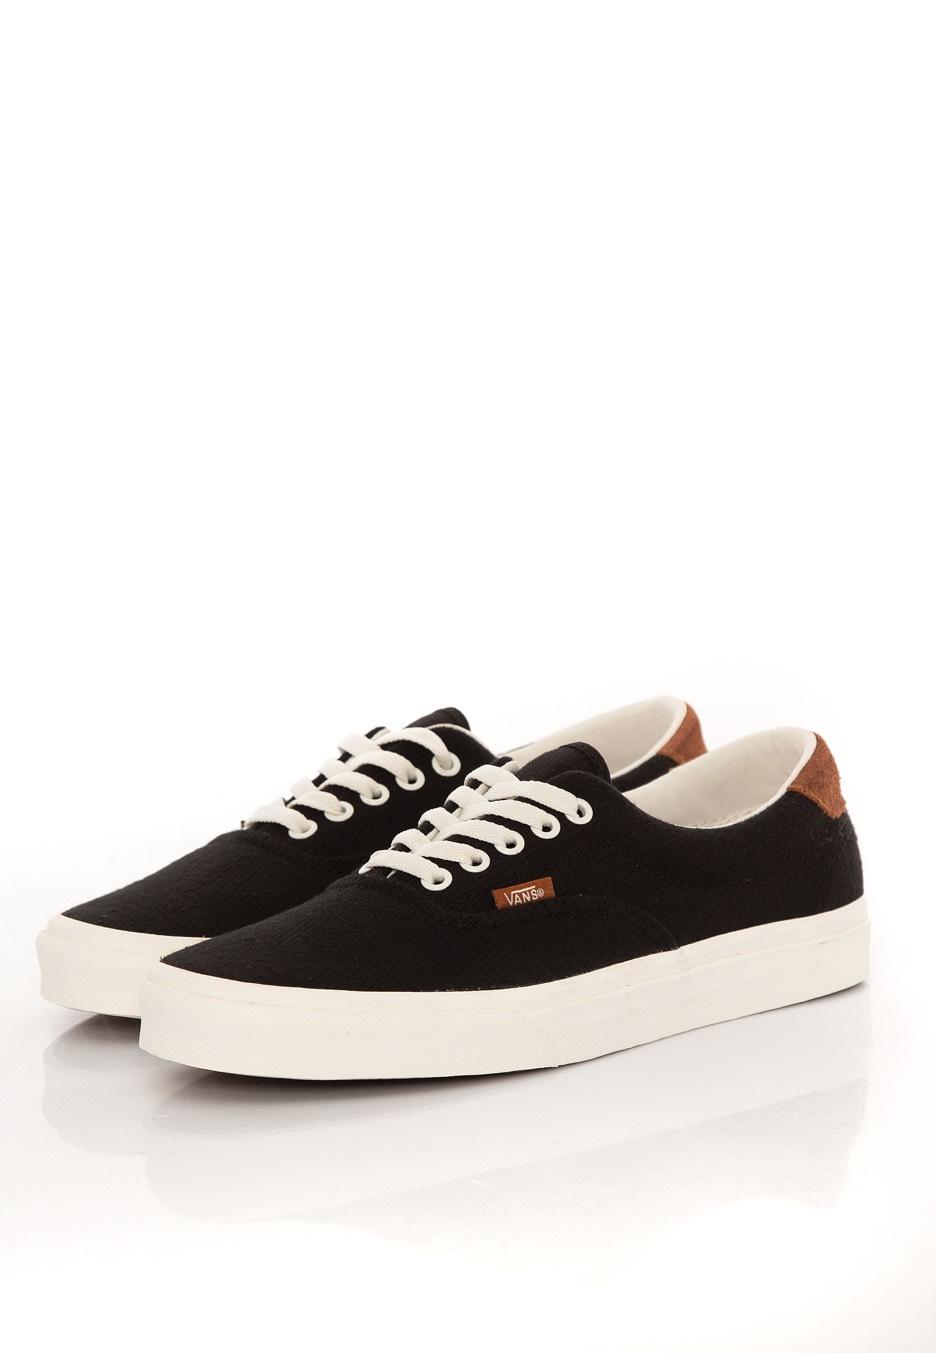 Vans - Era 59 Flannel Black - Scarpe